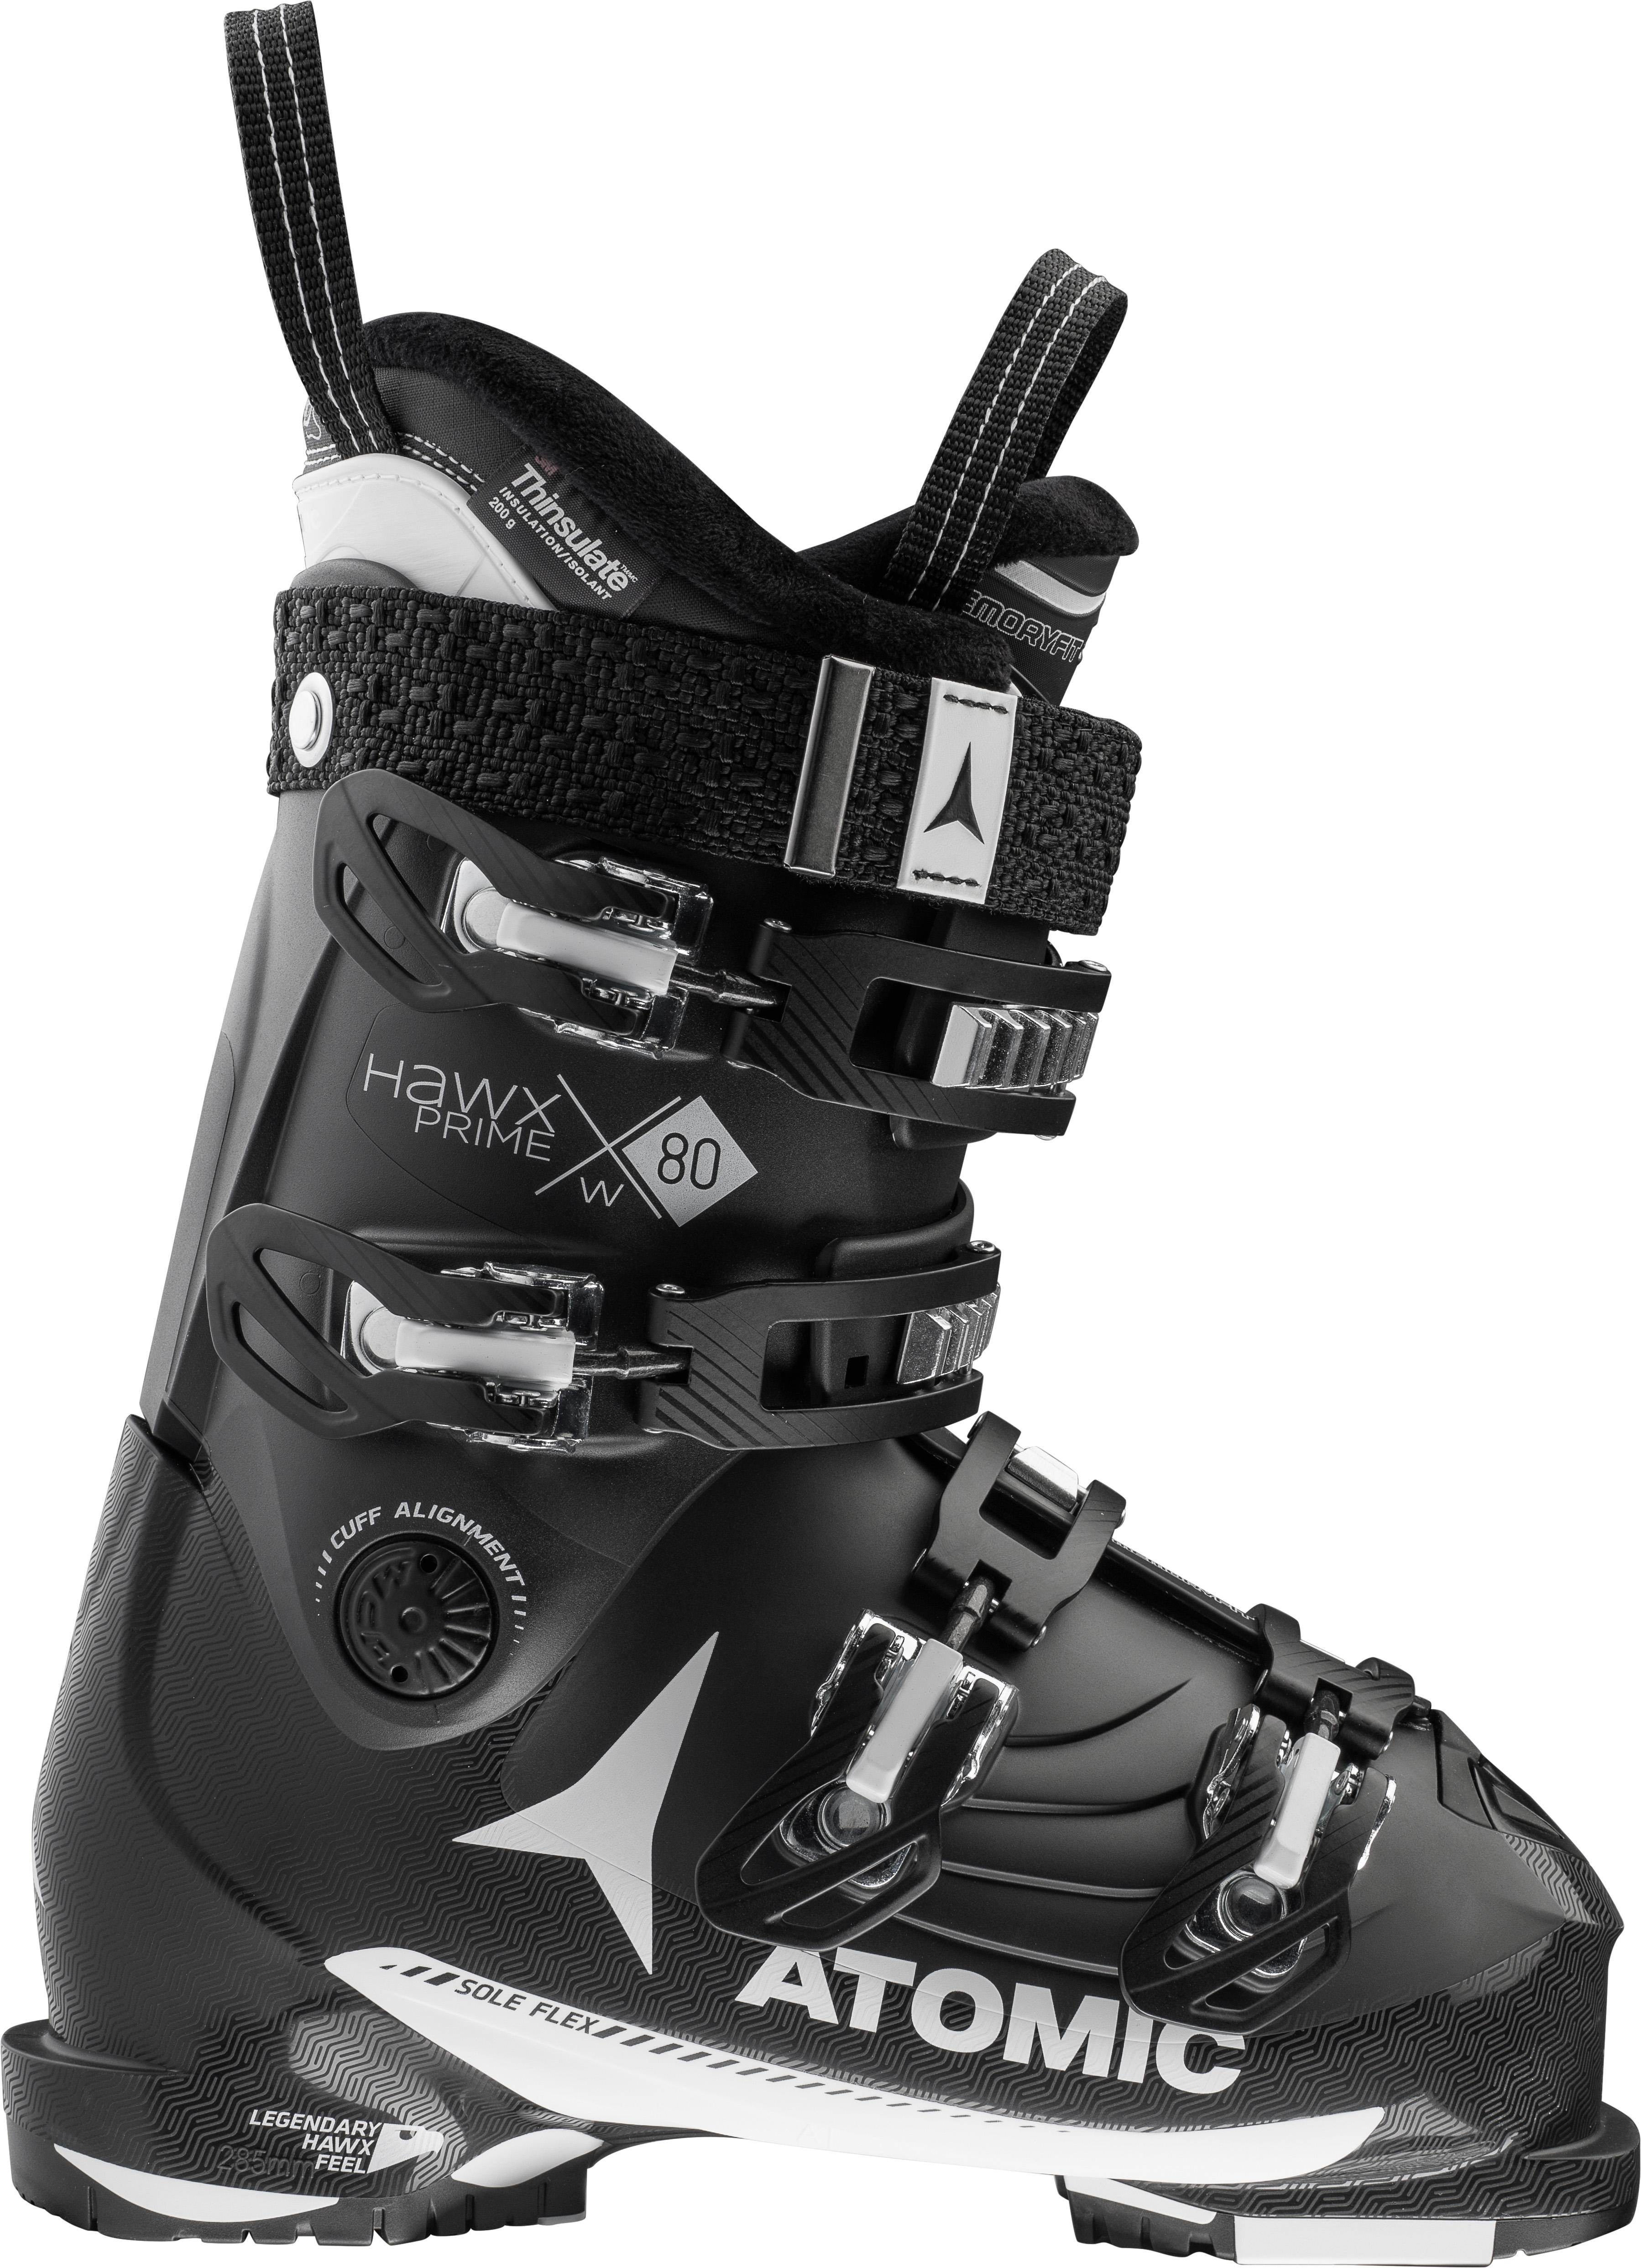 Atomic Hawx Prime 80 W Womens Ski Boots